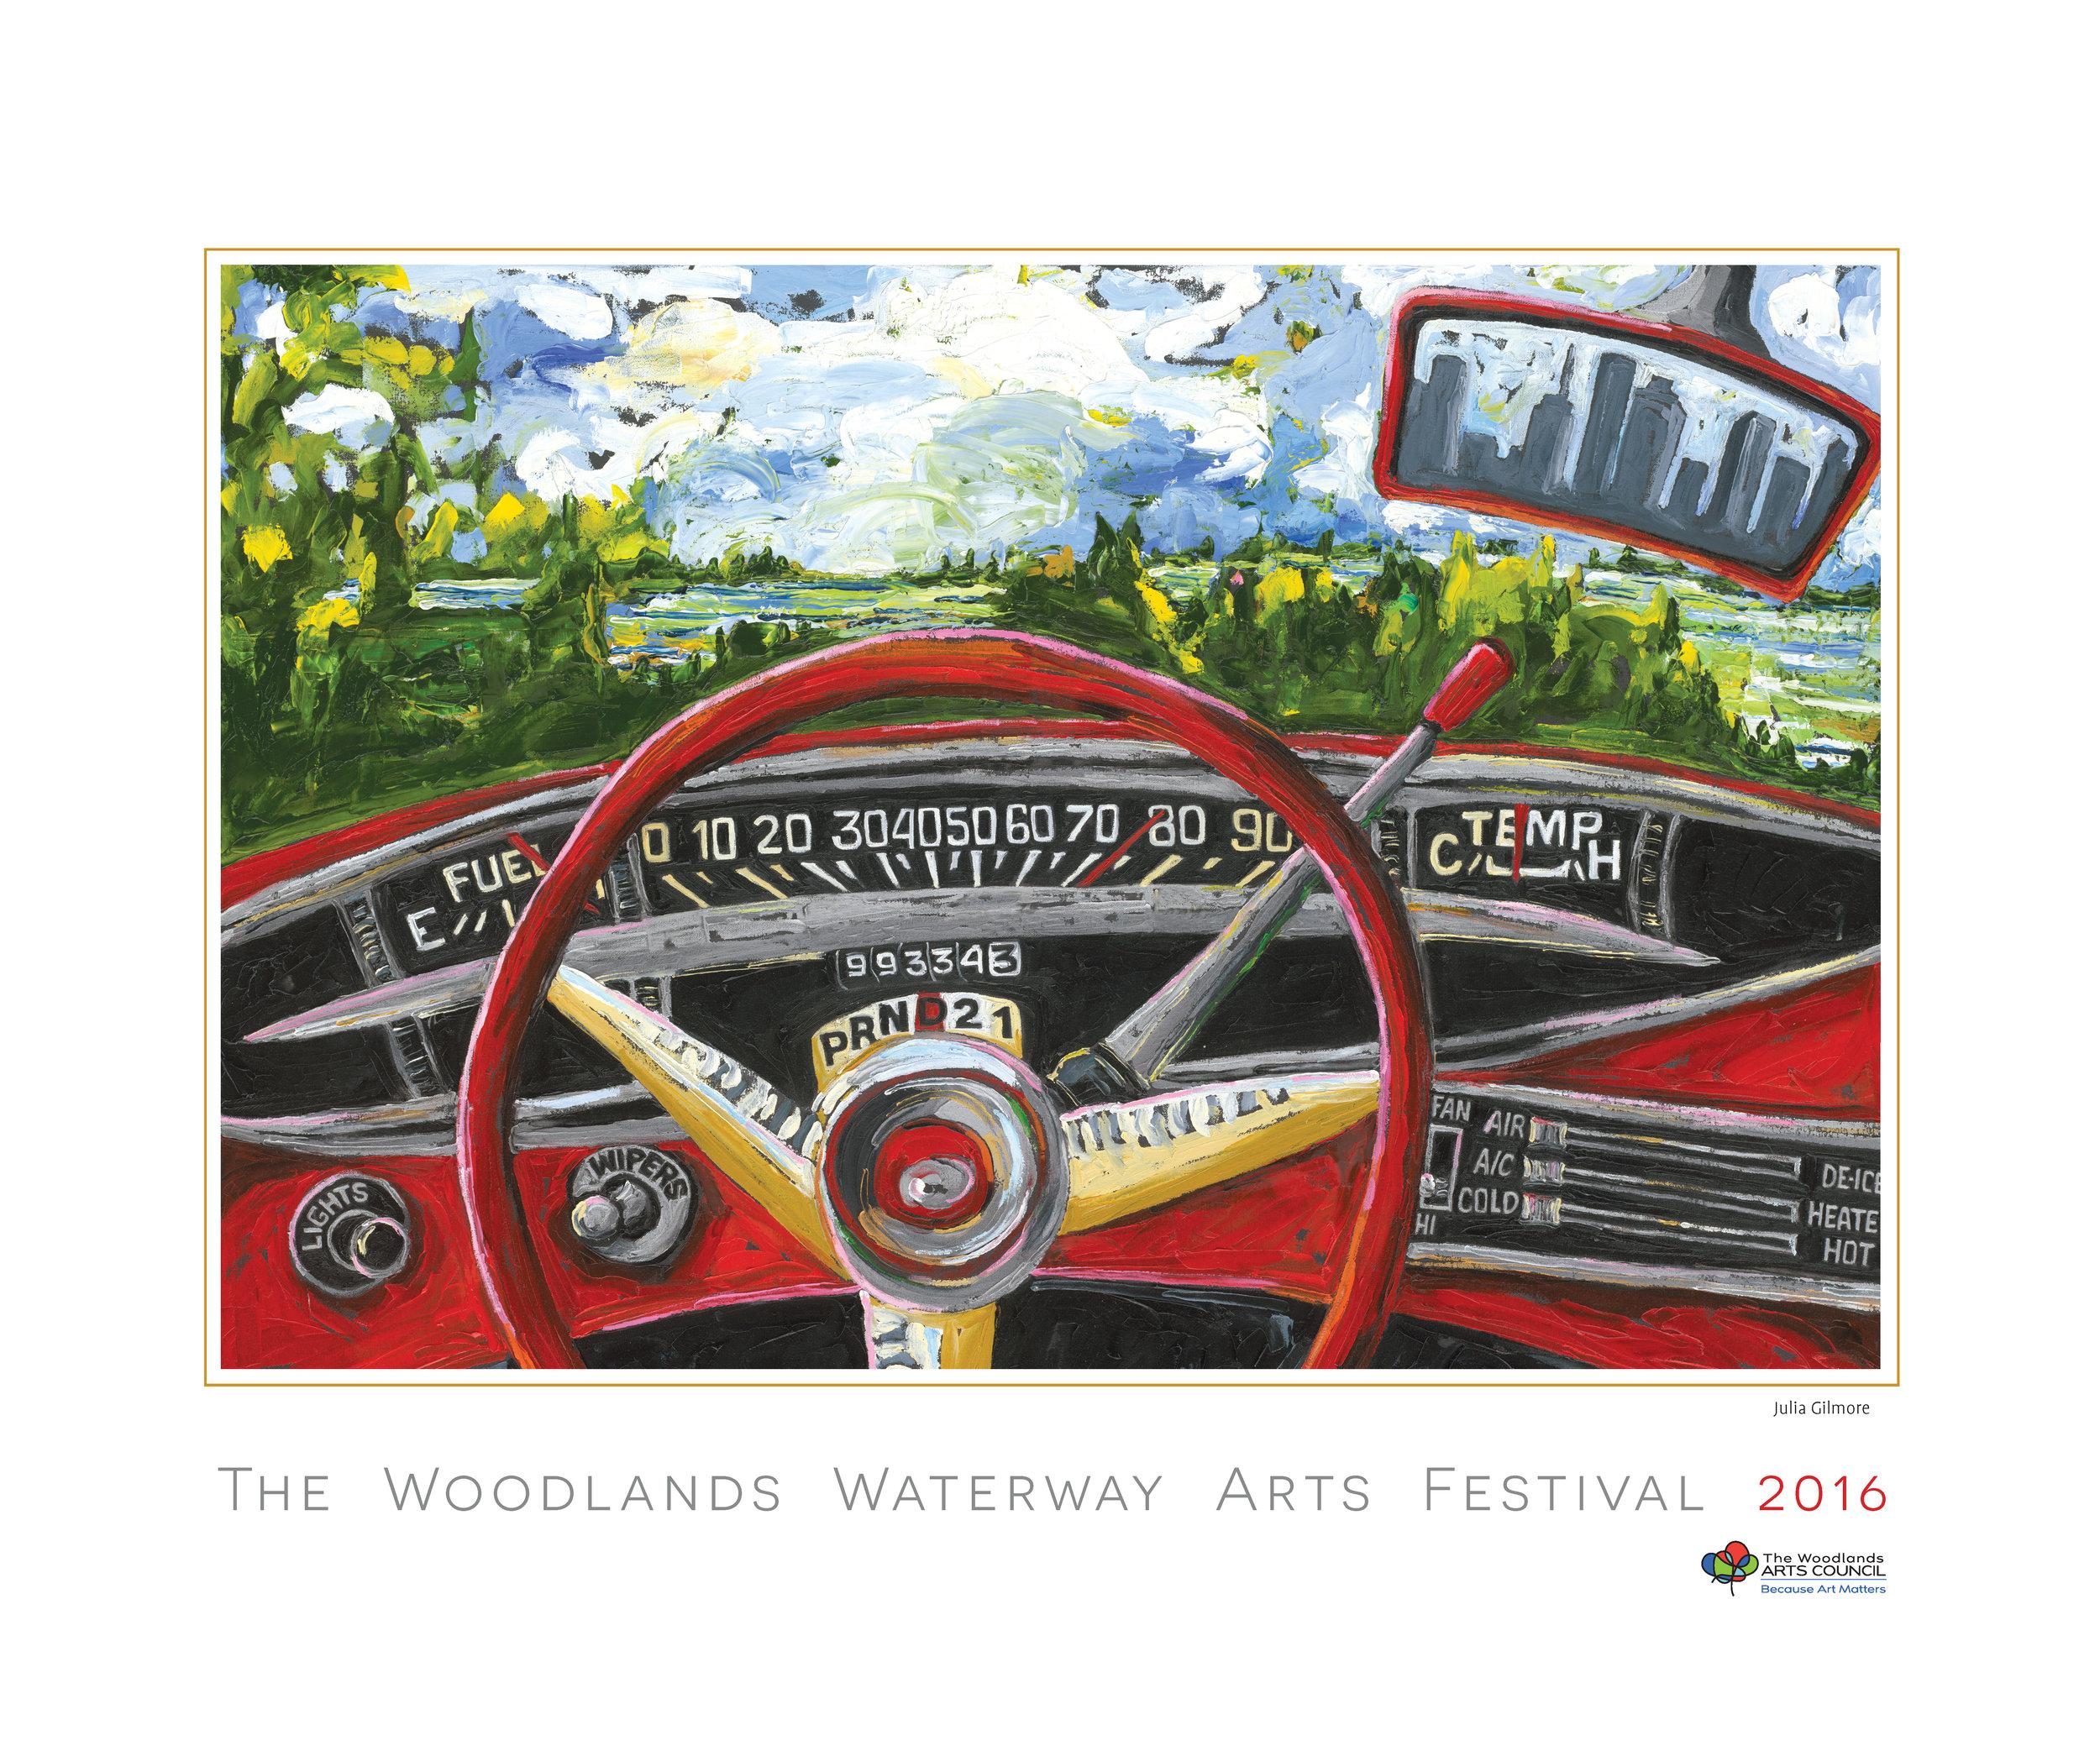 Woodlands Arts Festival